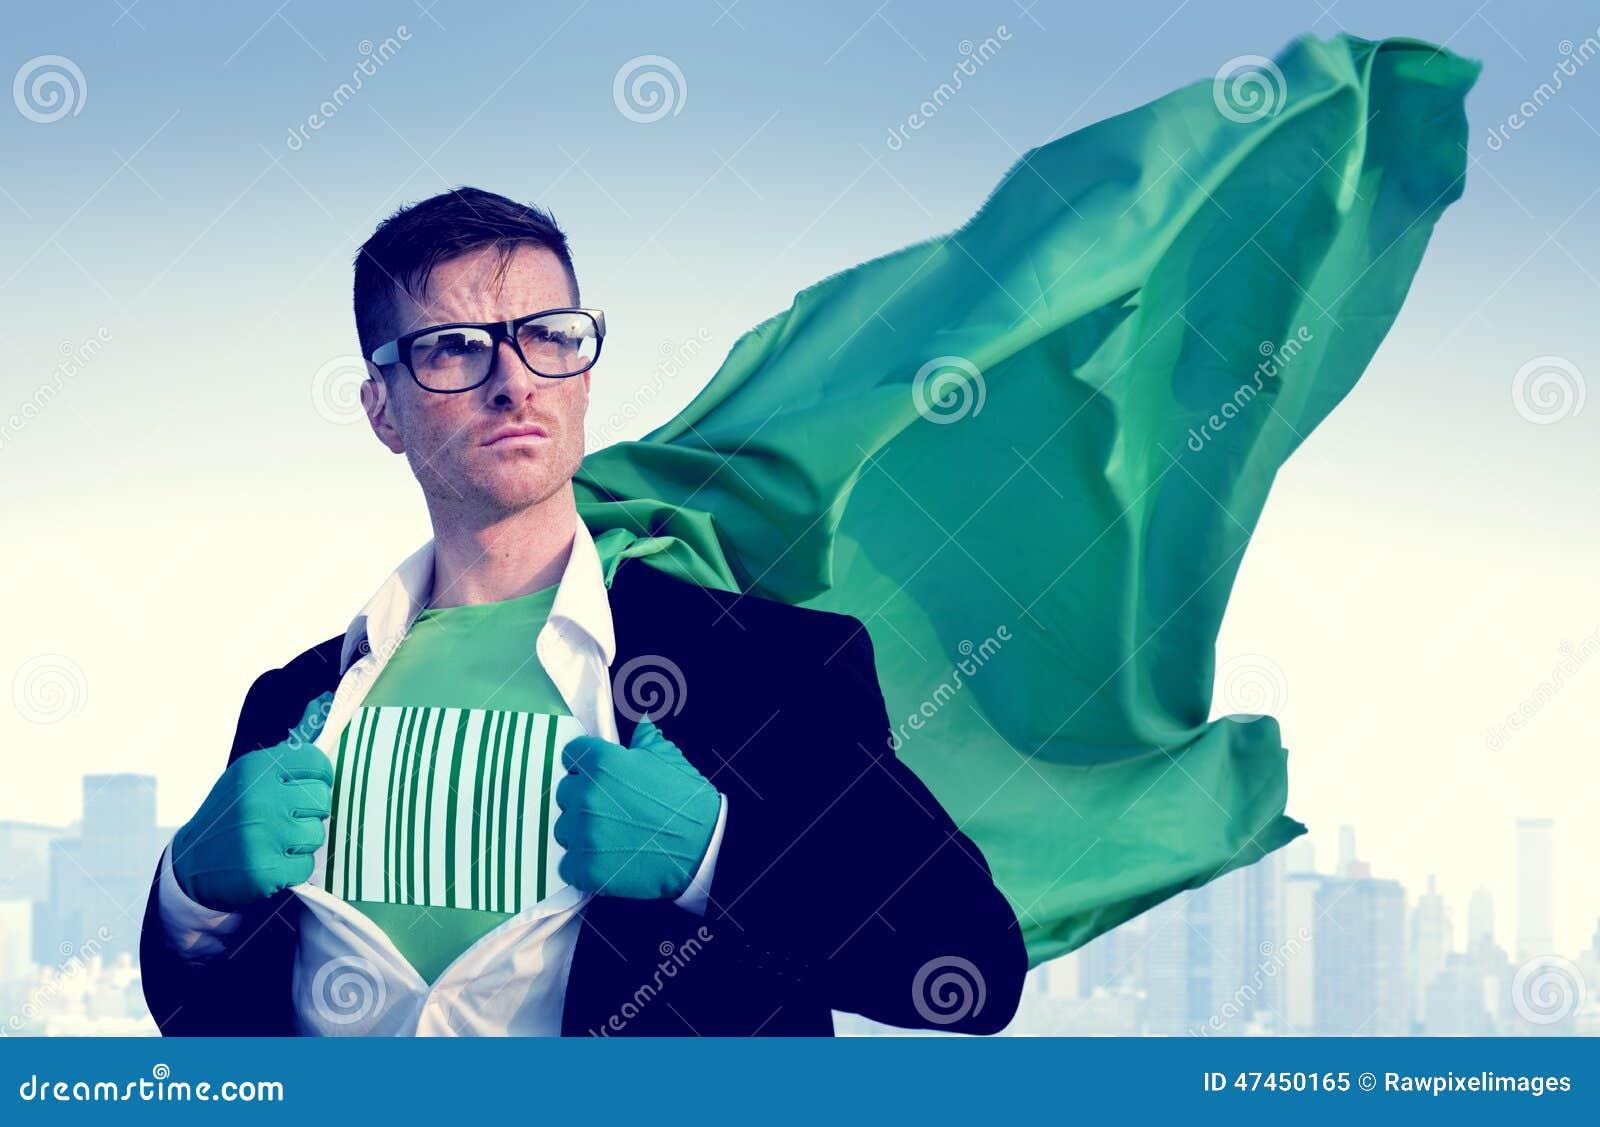 Stark Superheroaffärsman Success Empowerment Concept för Barcode